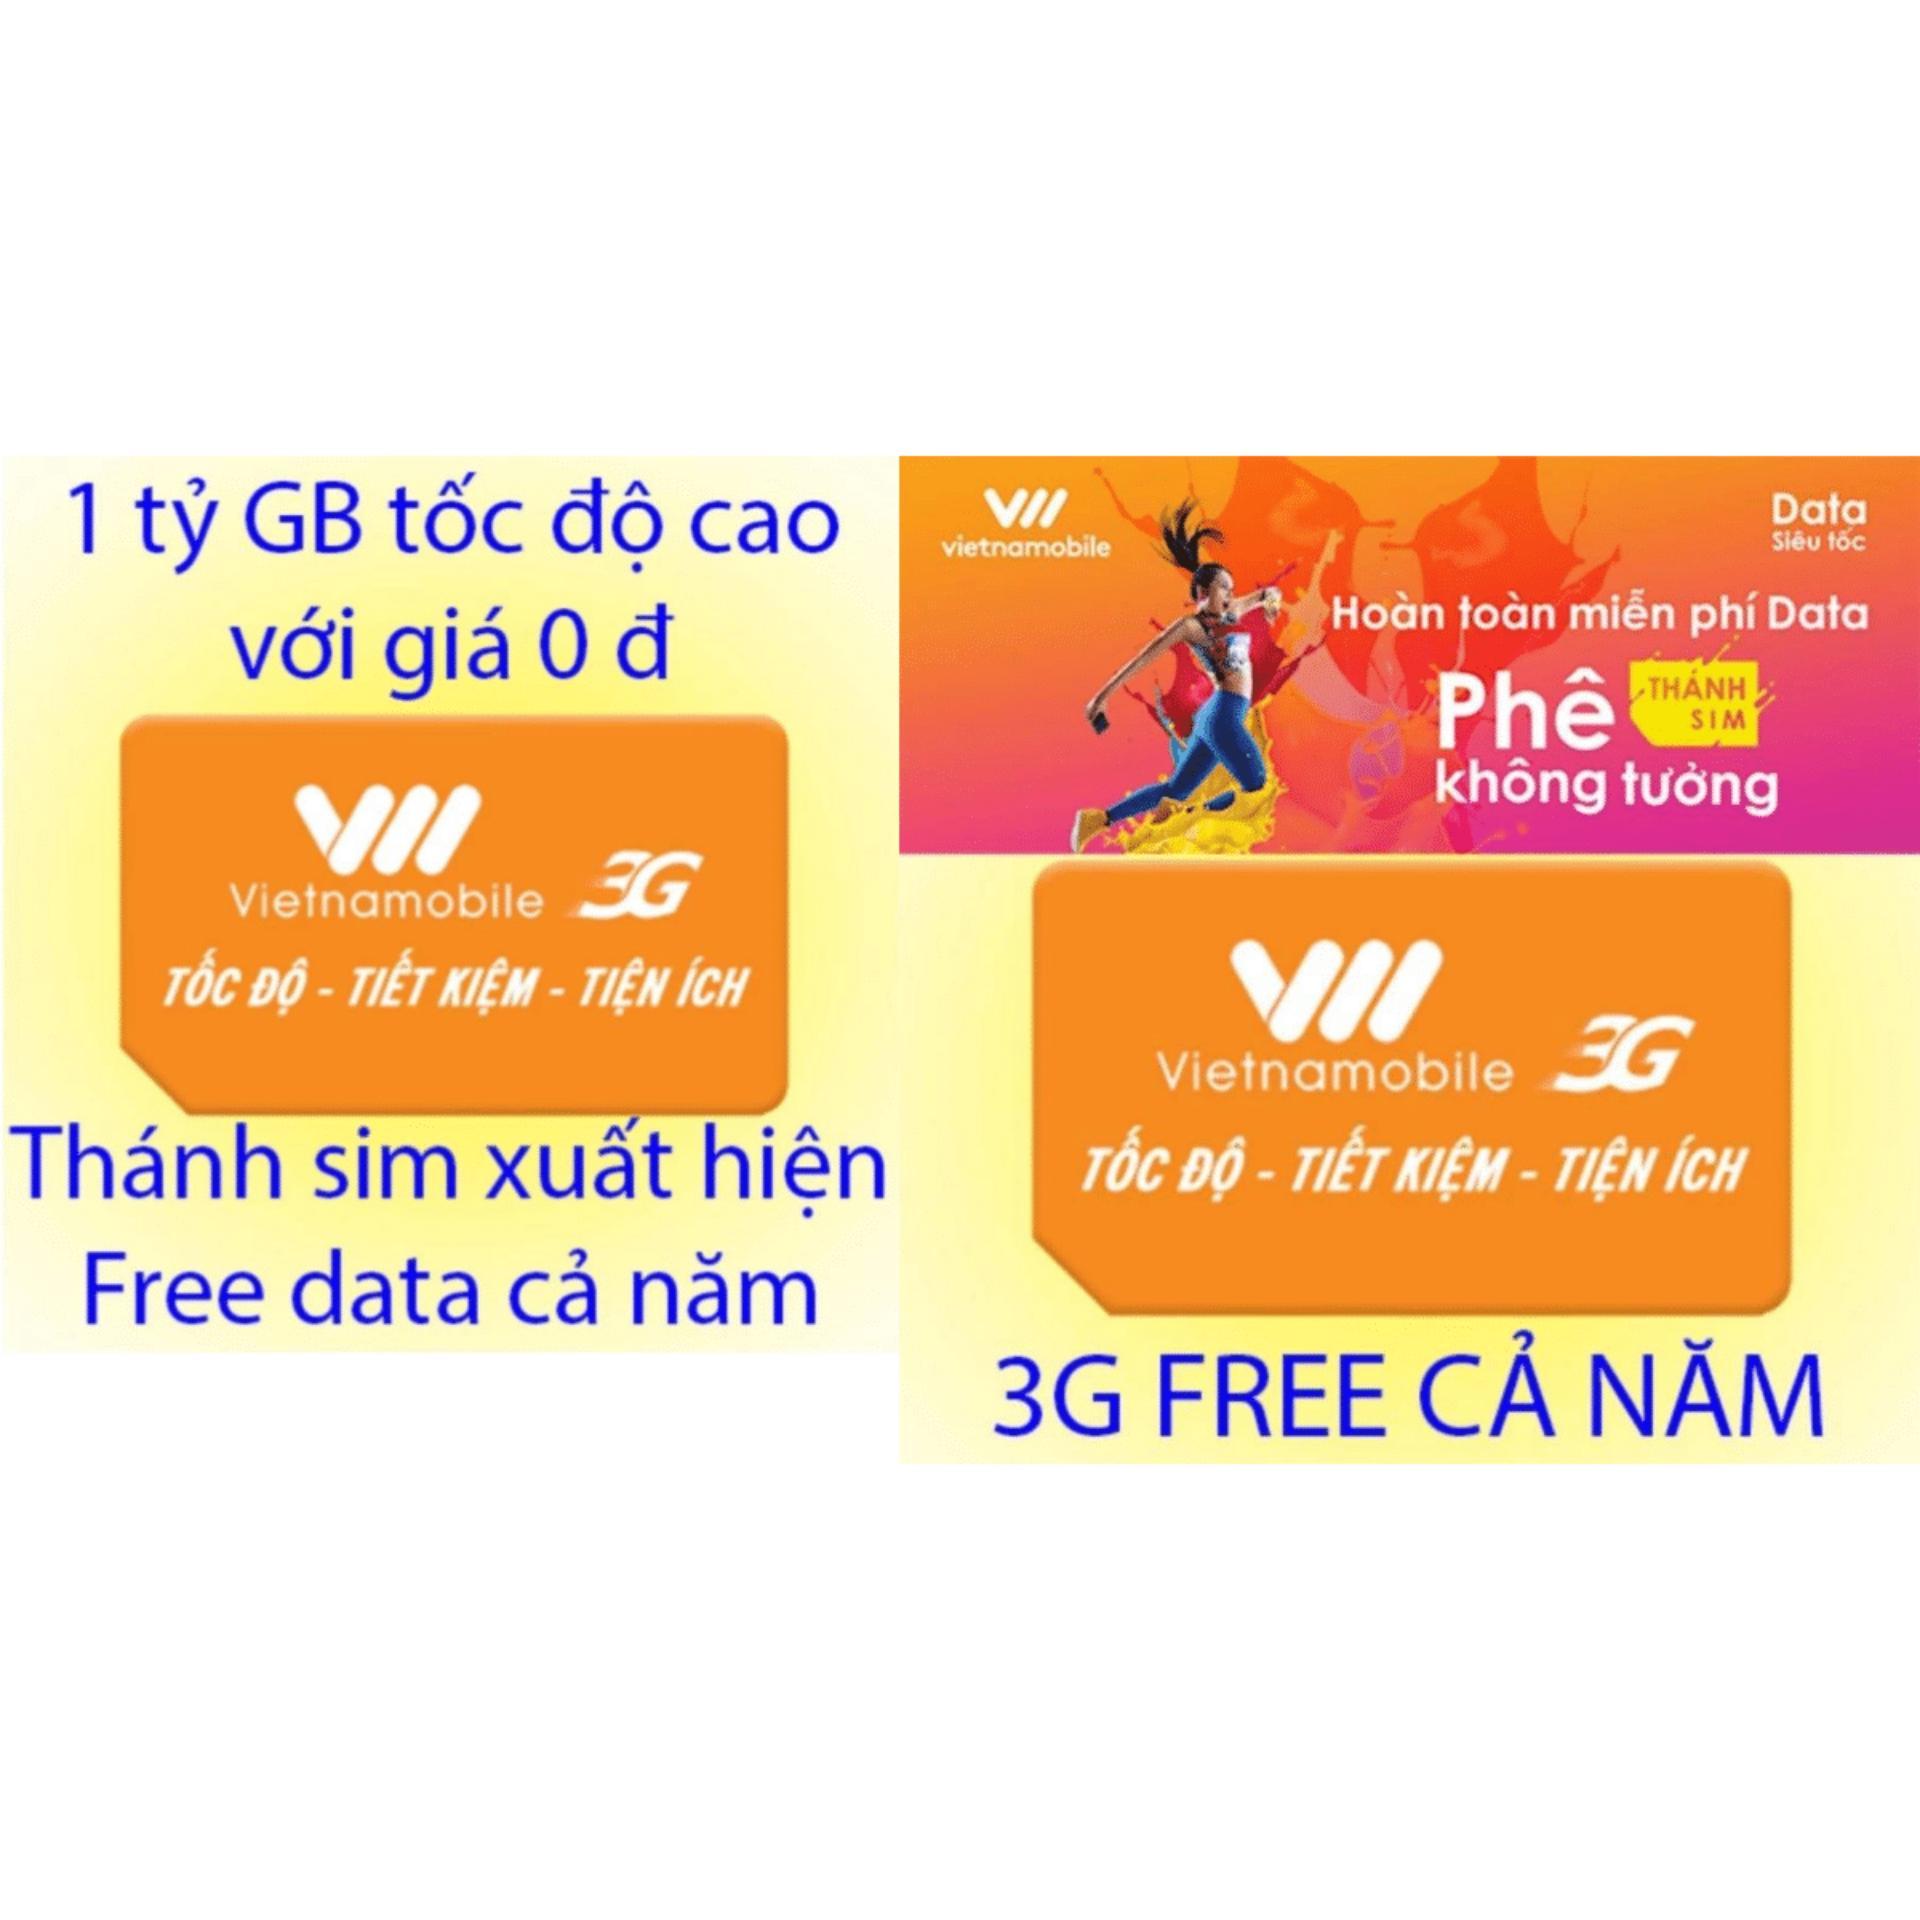 Ôn Tập Combo 10 Thanh Sim Vietnamobile Free Data